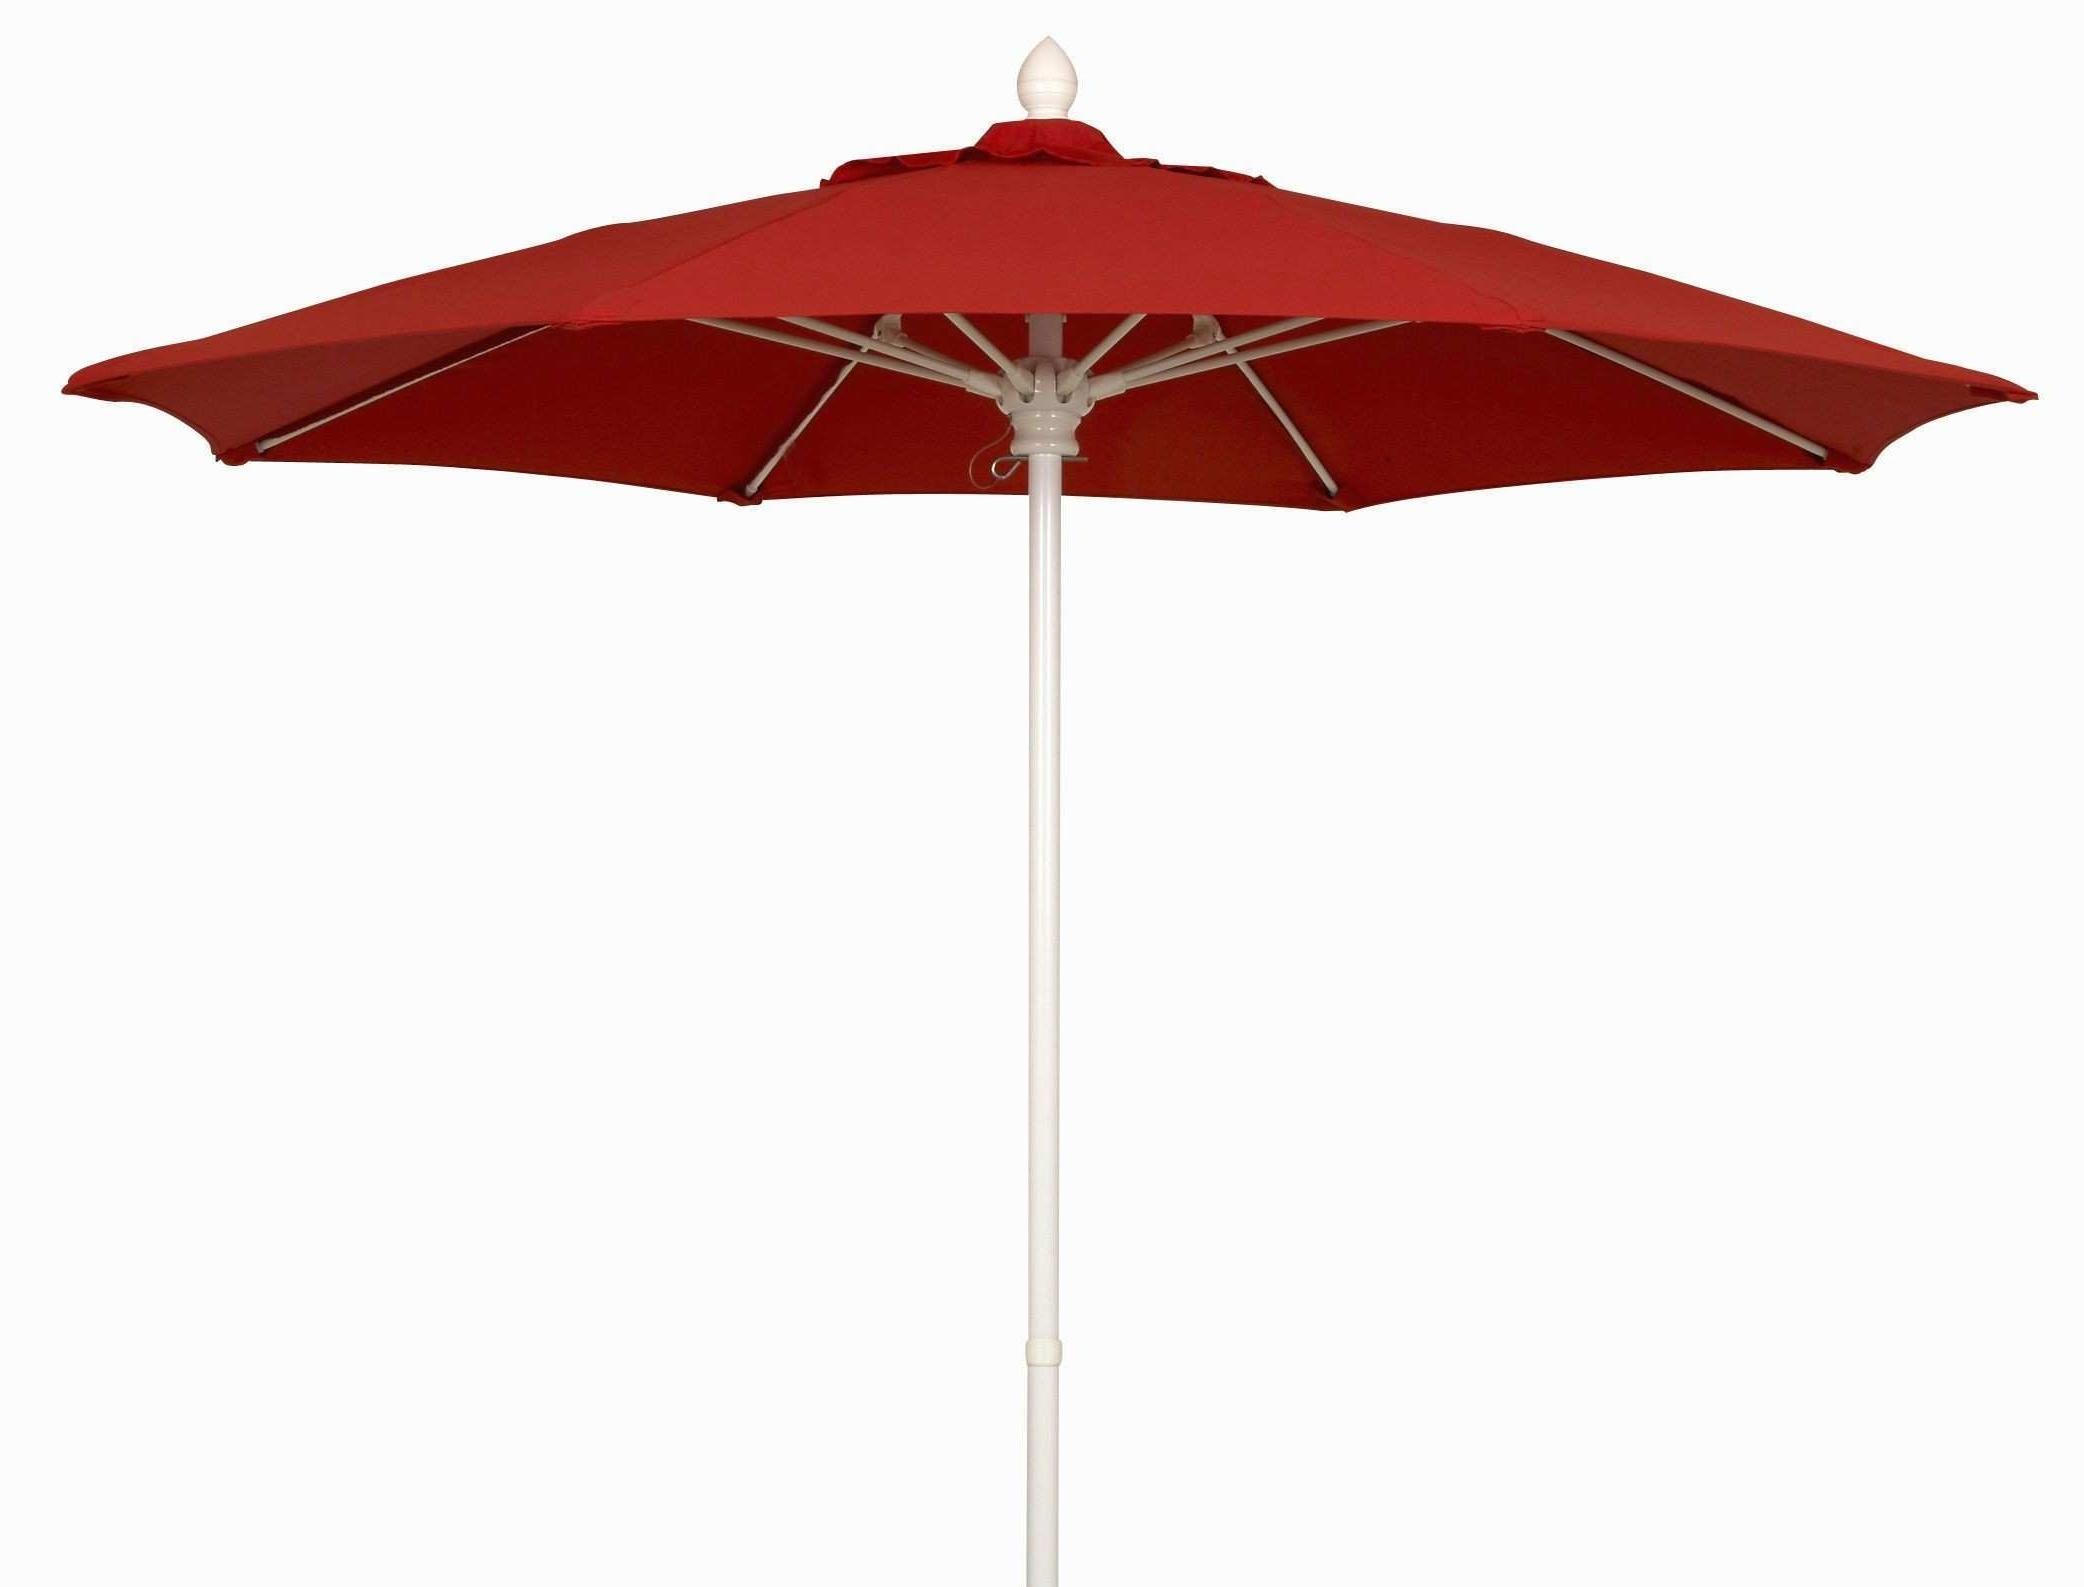 Recent 10 Ft Cantilever Patio Umbrella Elegant 6 Ft Patio Umbrella Pertaining To 6 Ft Patio Umbrellas (View 8 of 20)